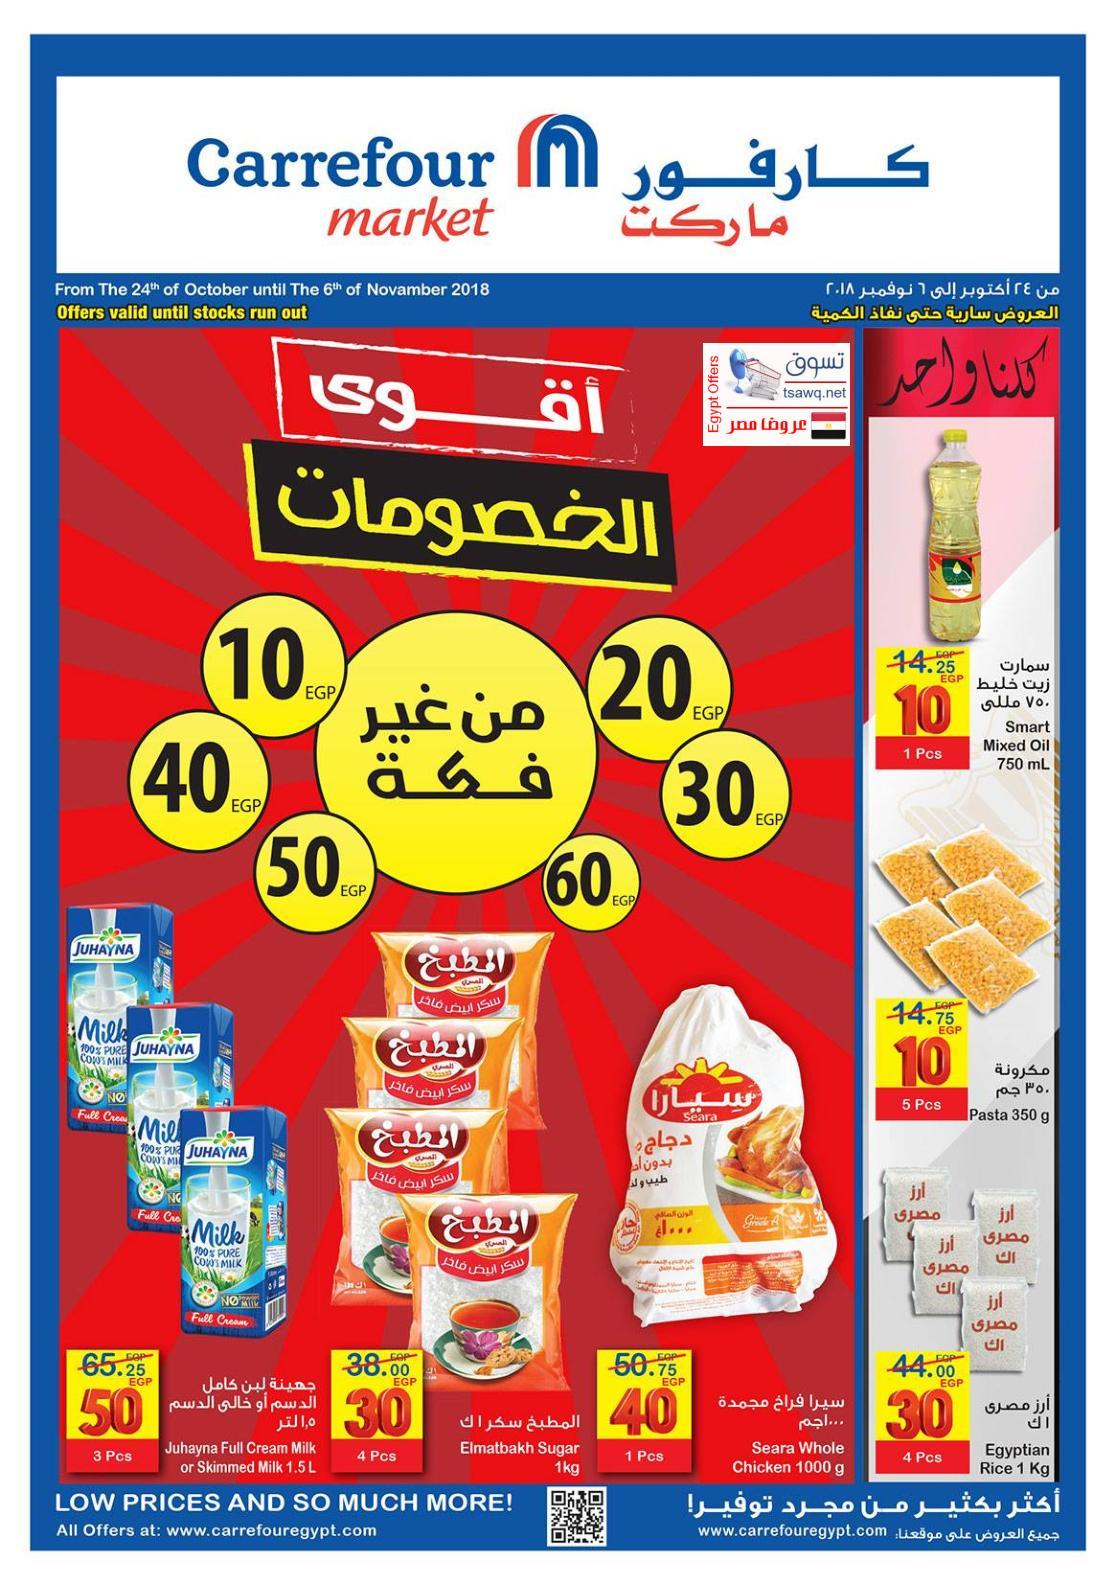 Calameo Tsawq Net Carrefour Market Egypt 24 10 2018